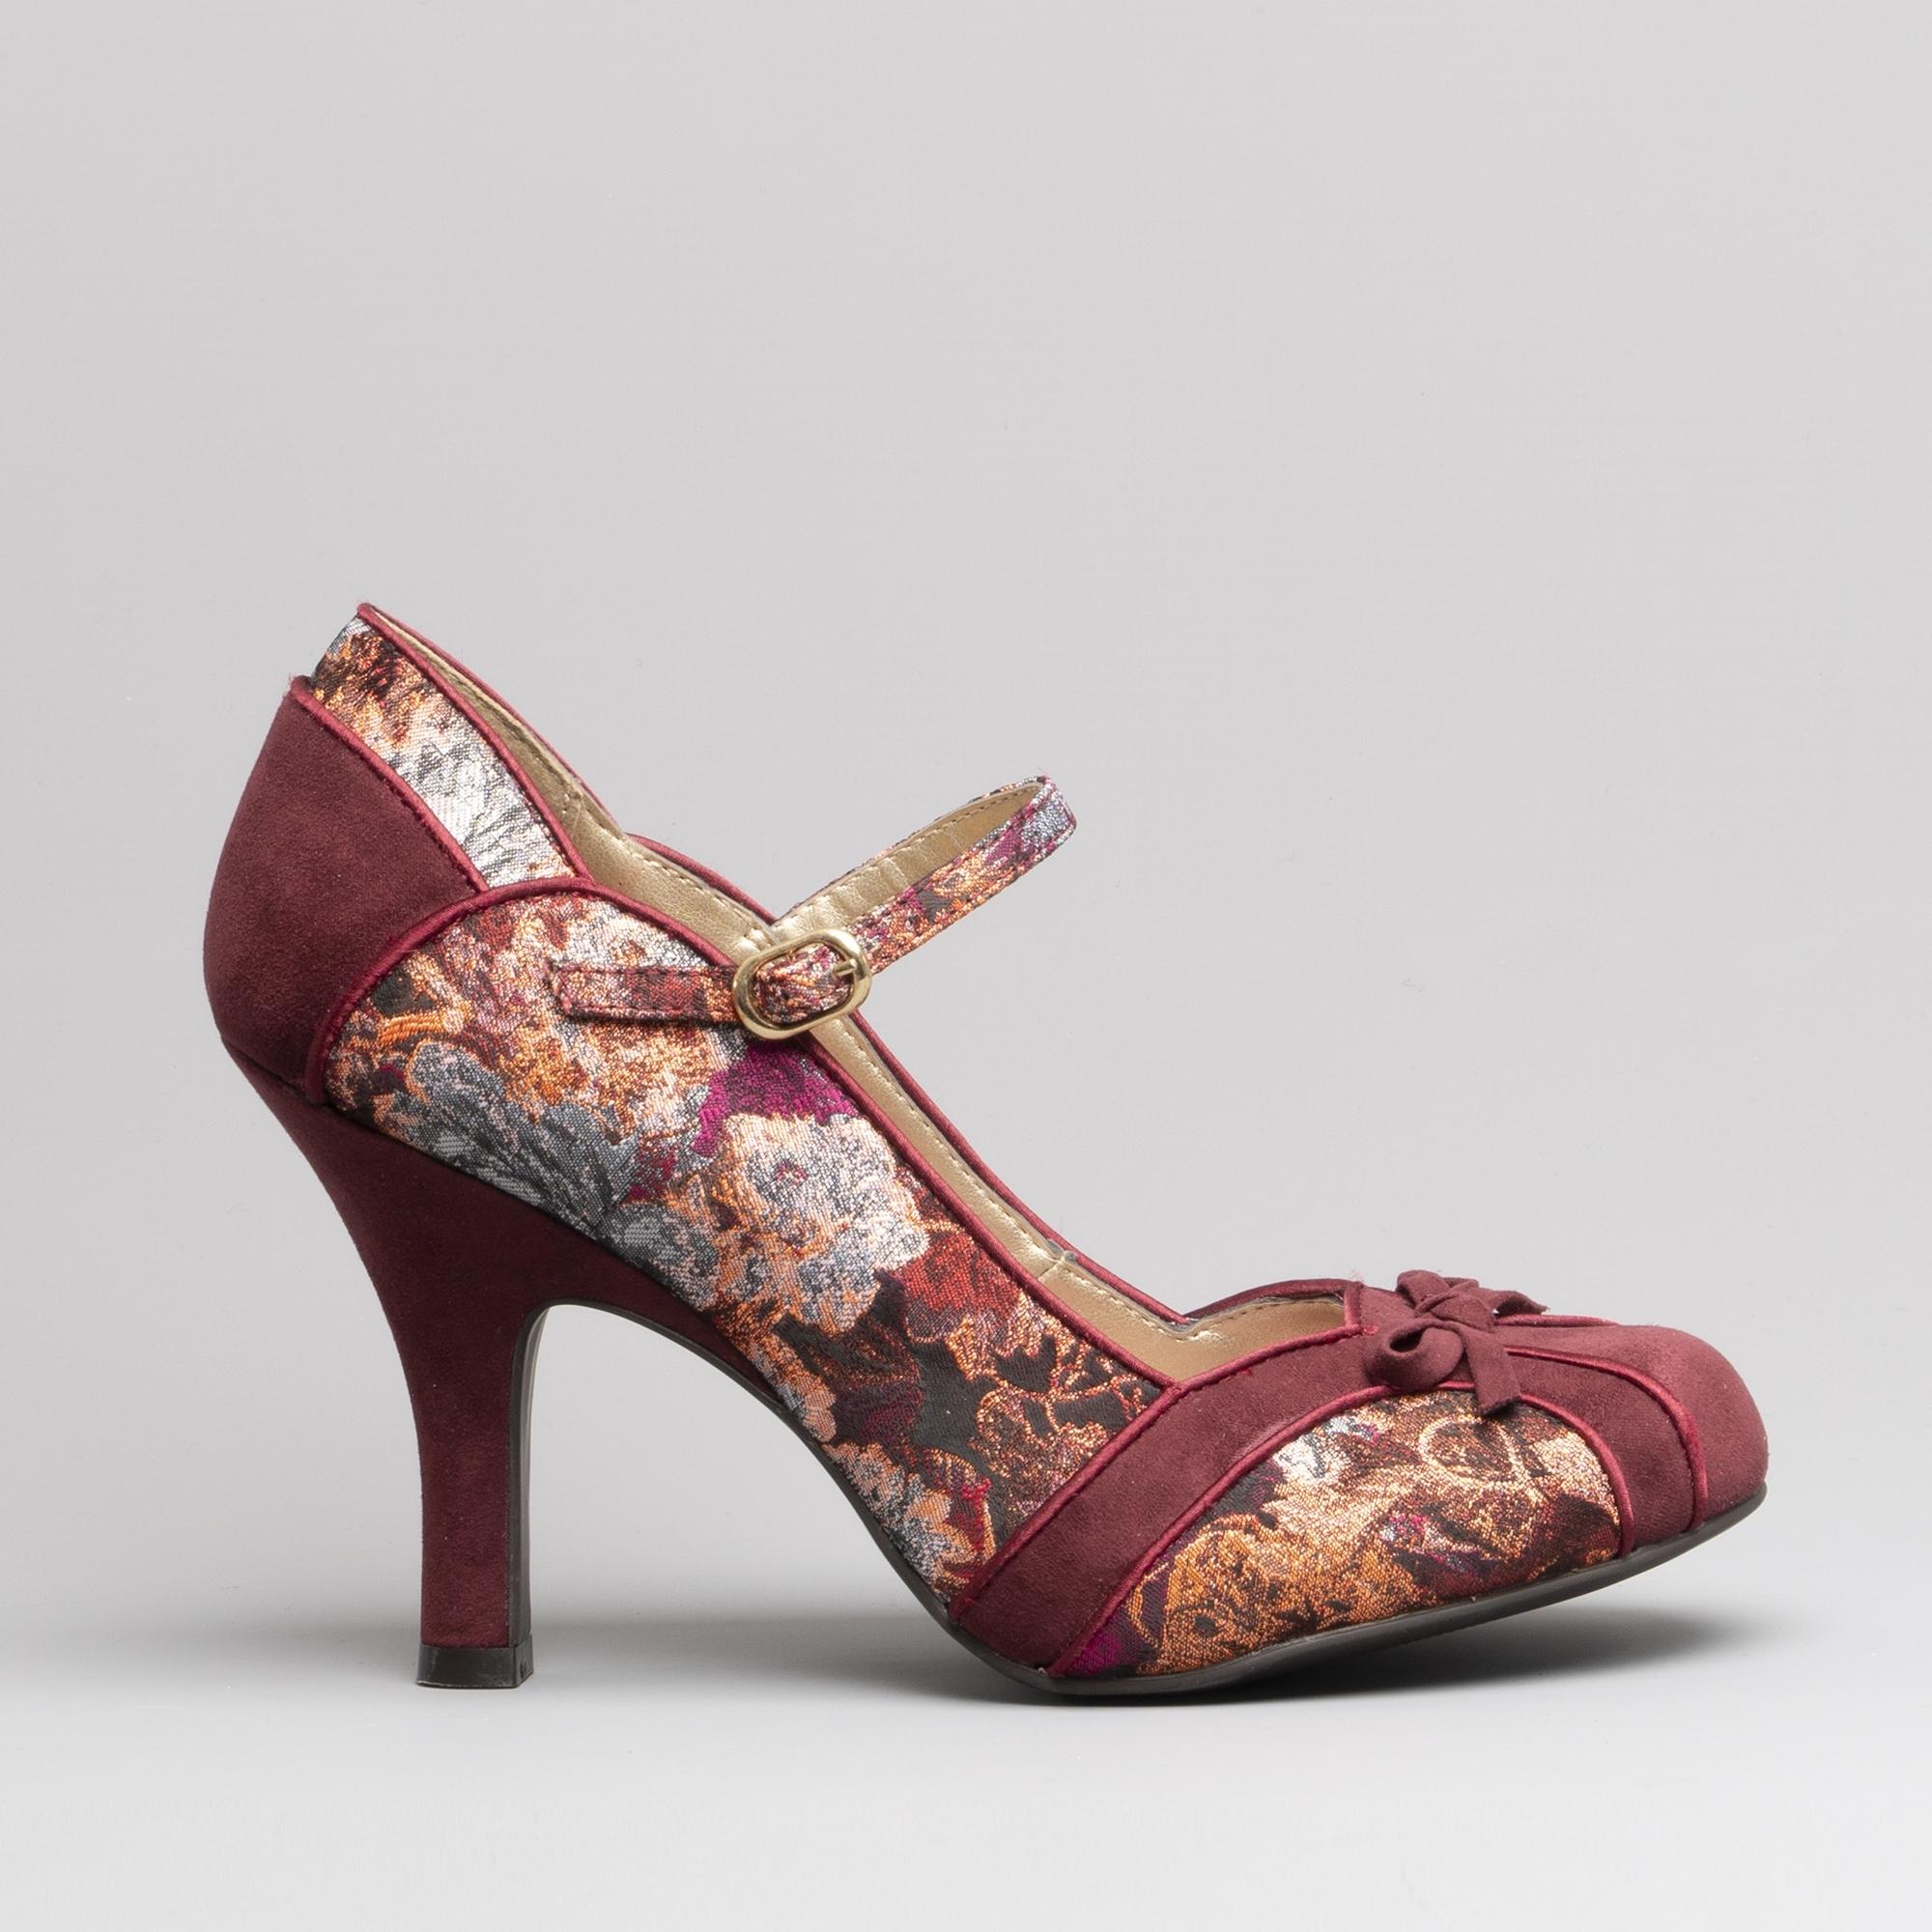 fbd4d889b8 Ruby Shoo CLEO Ladies High Heel Shoes Burgundy | Shuperb